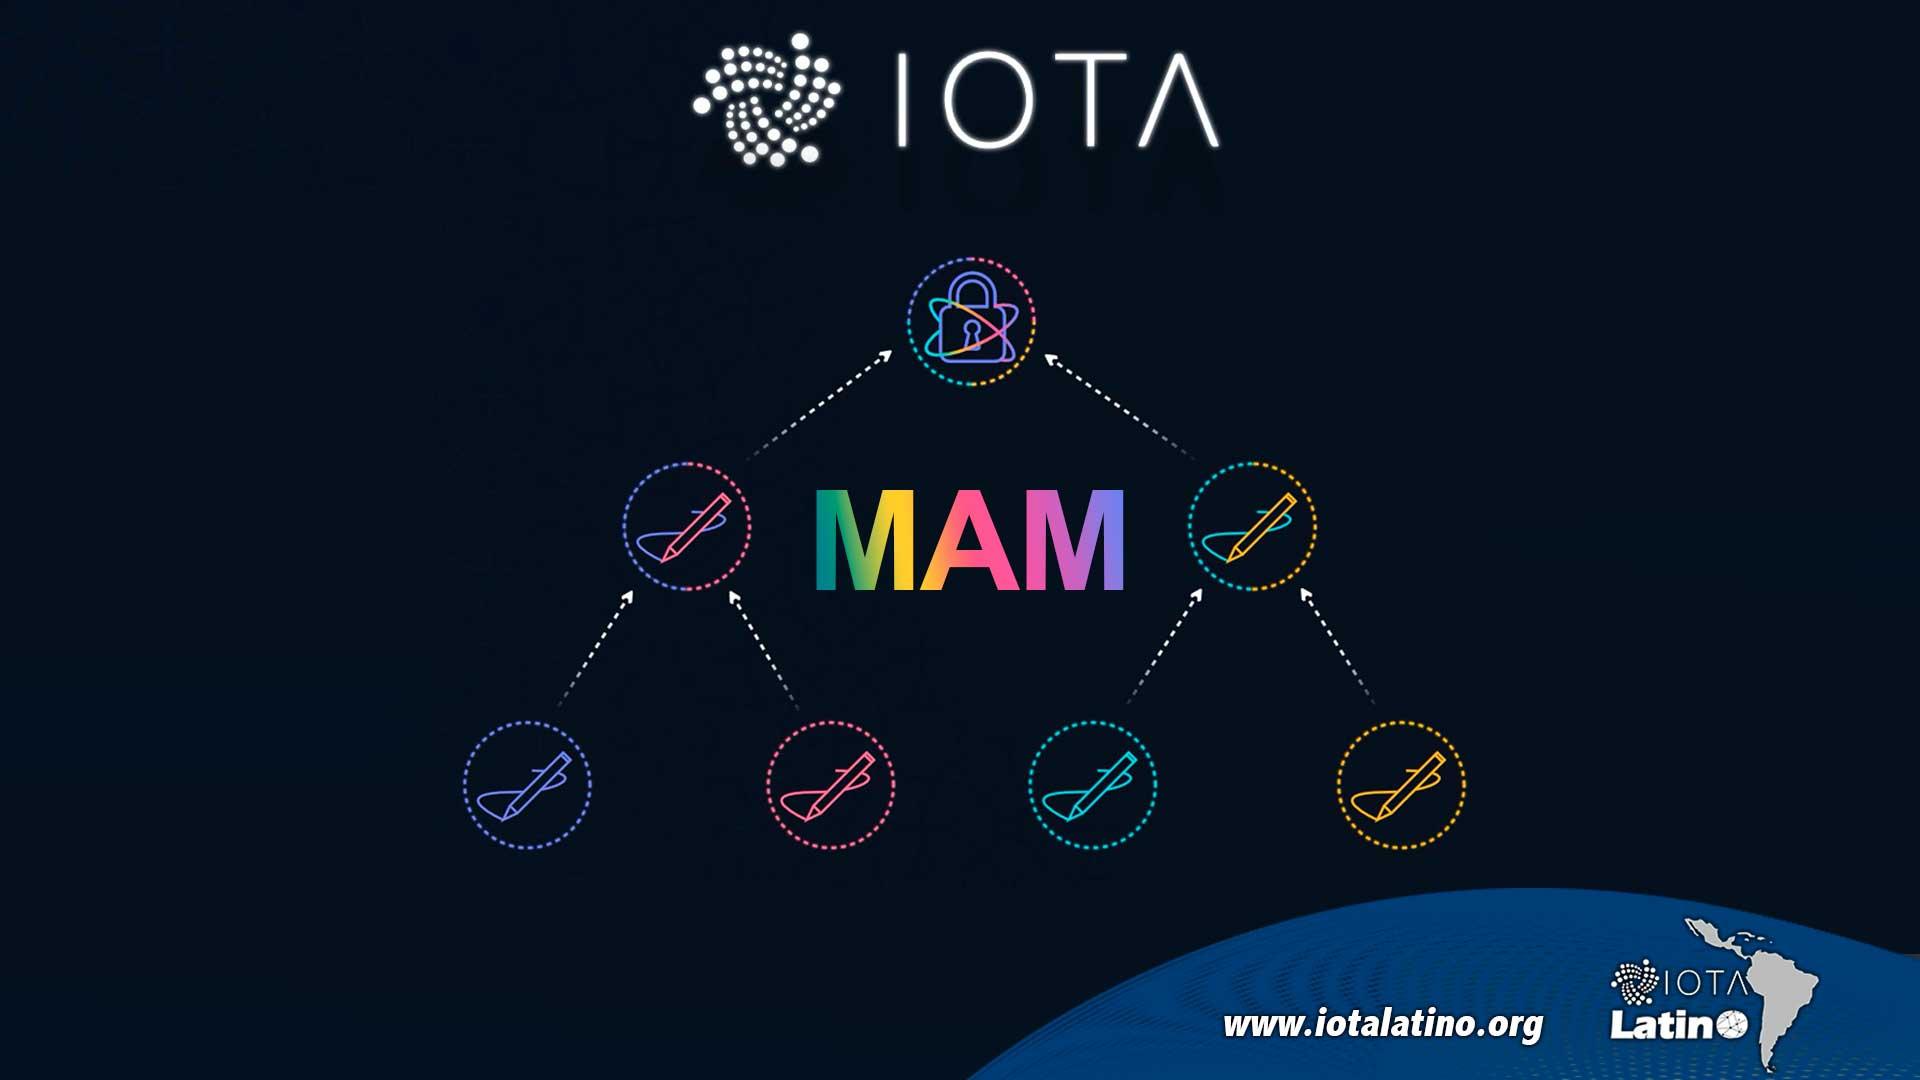 MAM de IOTA - IOTA Latino